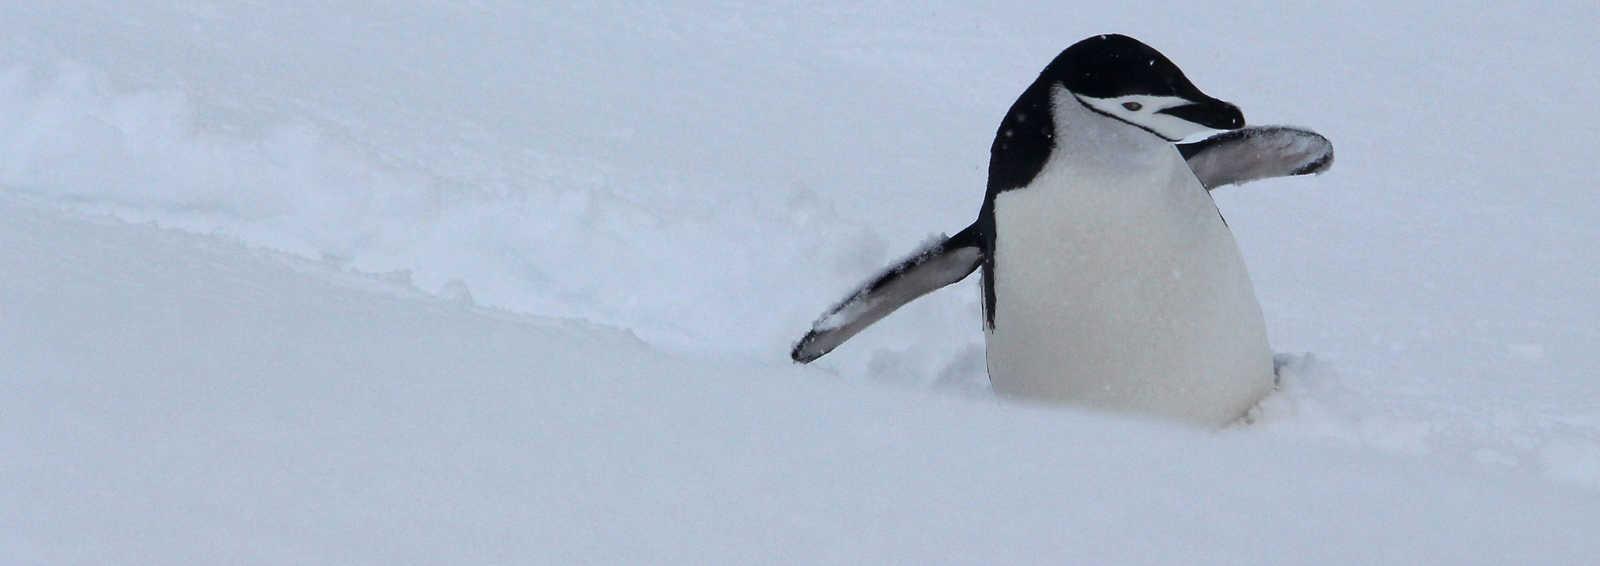 Chinstrap penguin on Half Moon Island